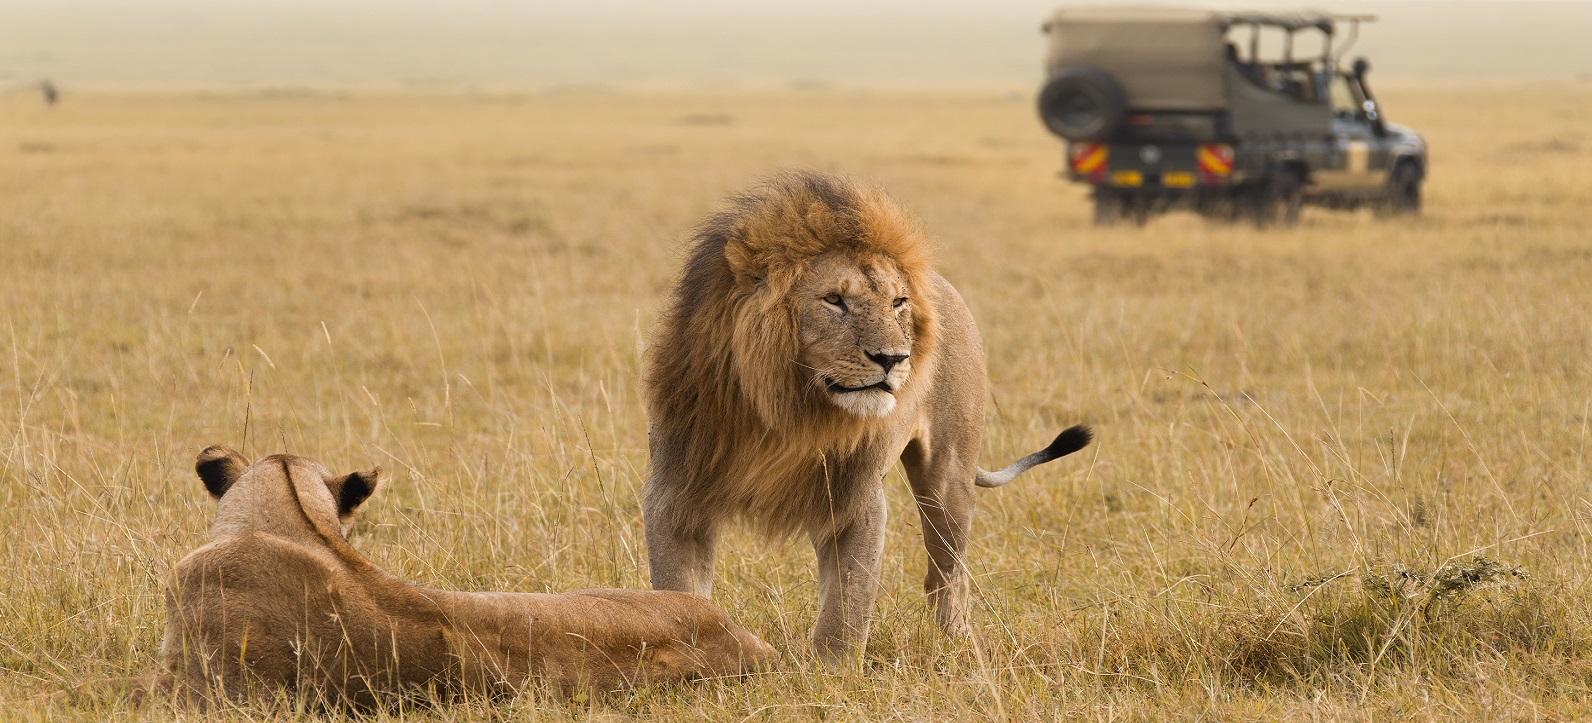 Гранд сафари в Кении